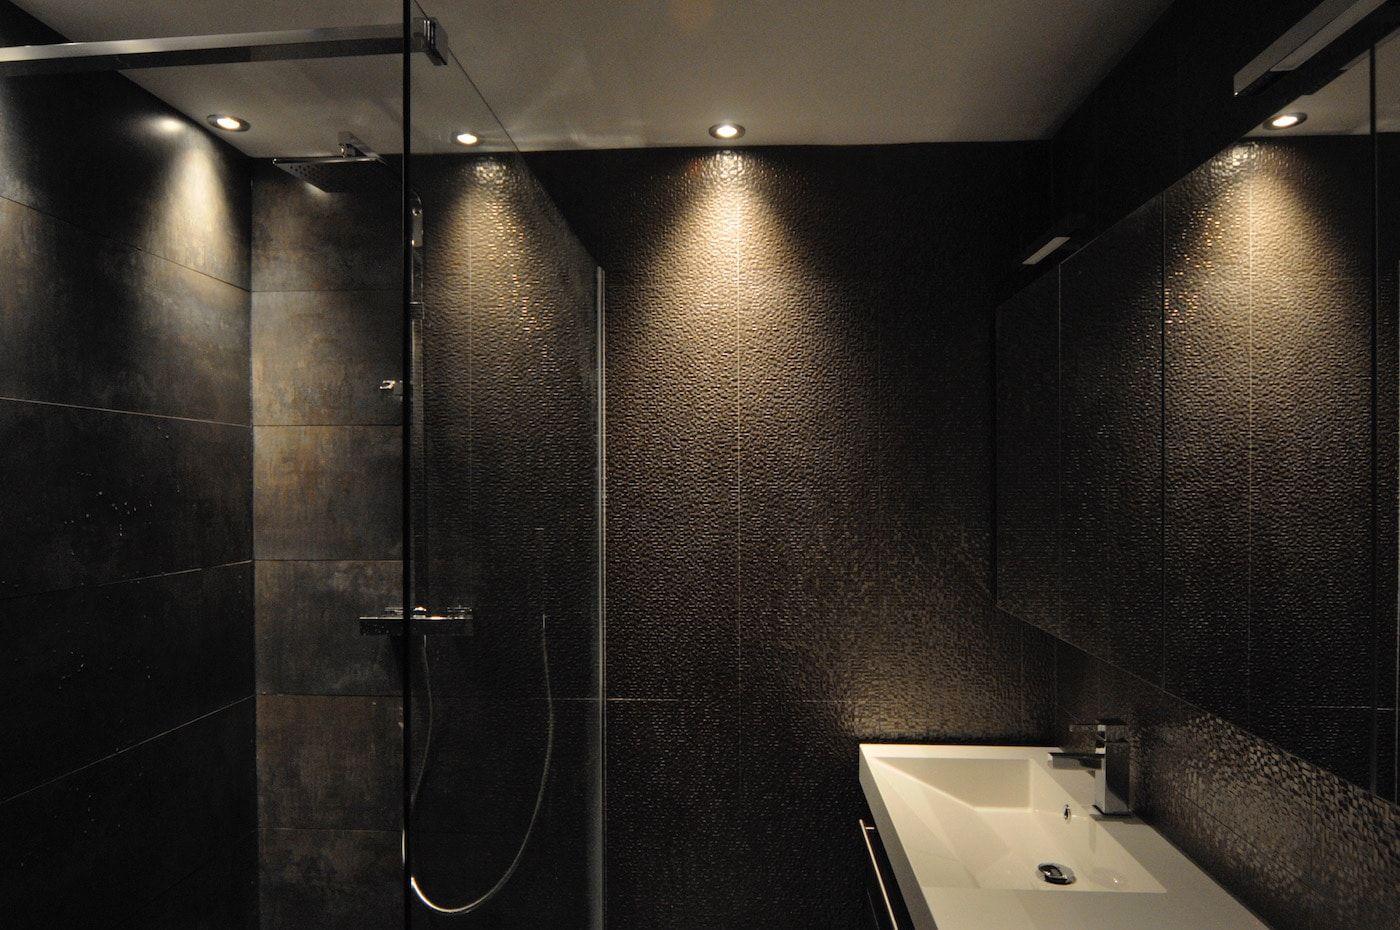 Kleine Badkamer Amsterdam : Referentie amsterdam groots van opzet in een kleine badkamer